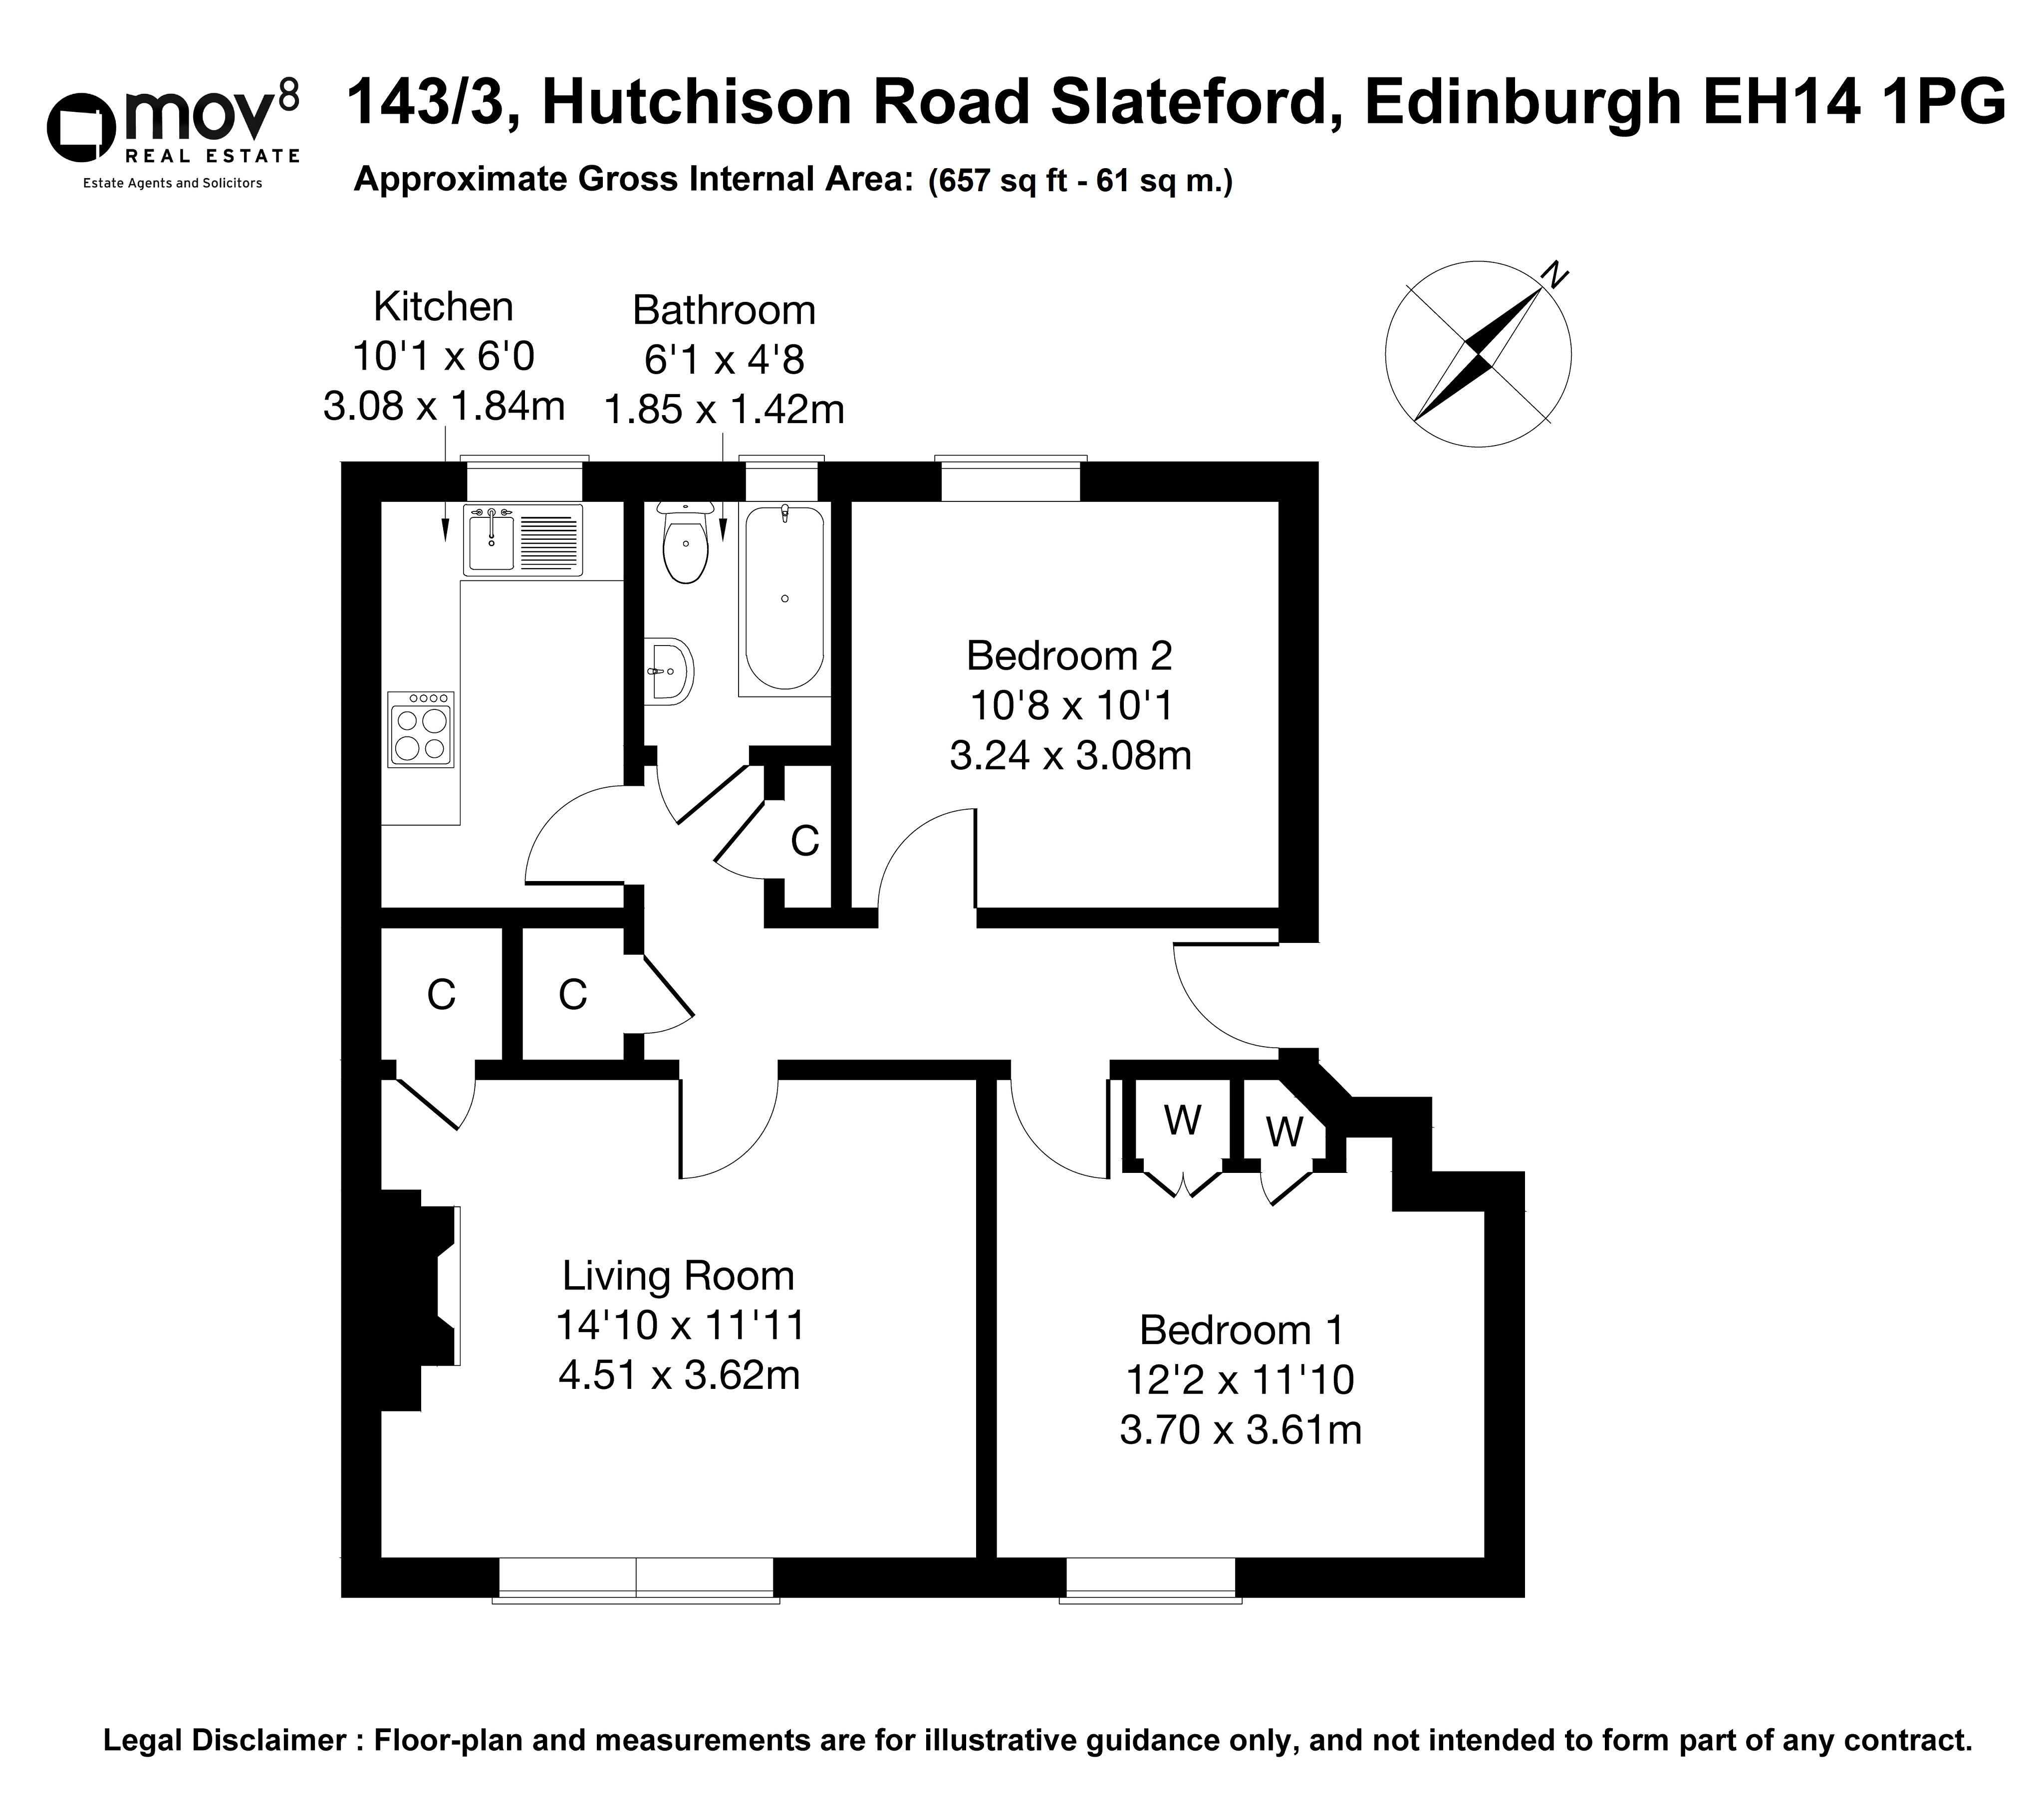 Floorplan 1 of 143/3, Hutchison Road, Slateford, Edinburgh, EH14 1PG